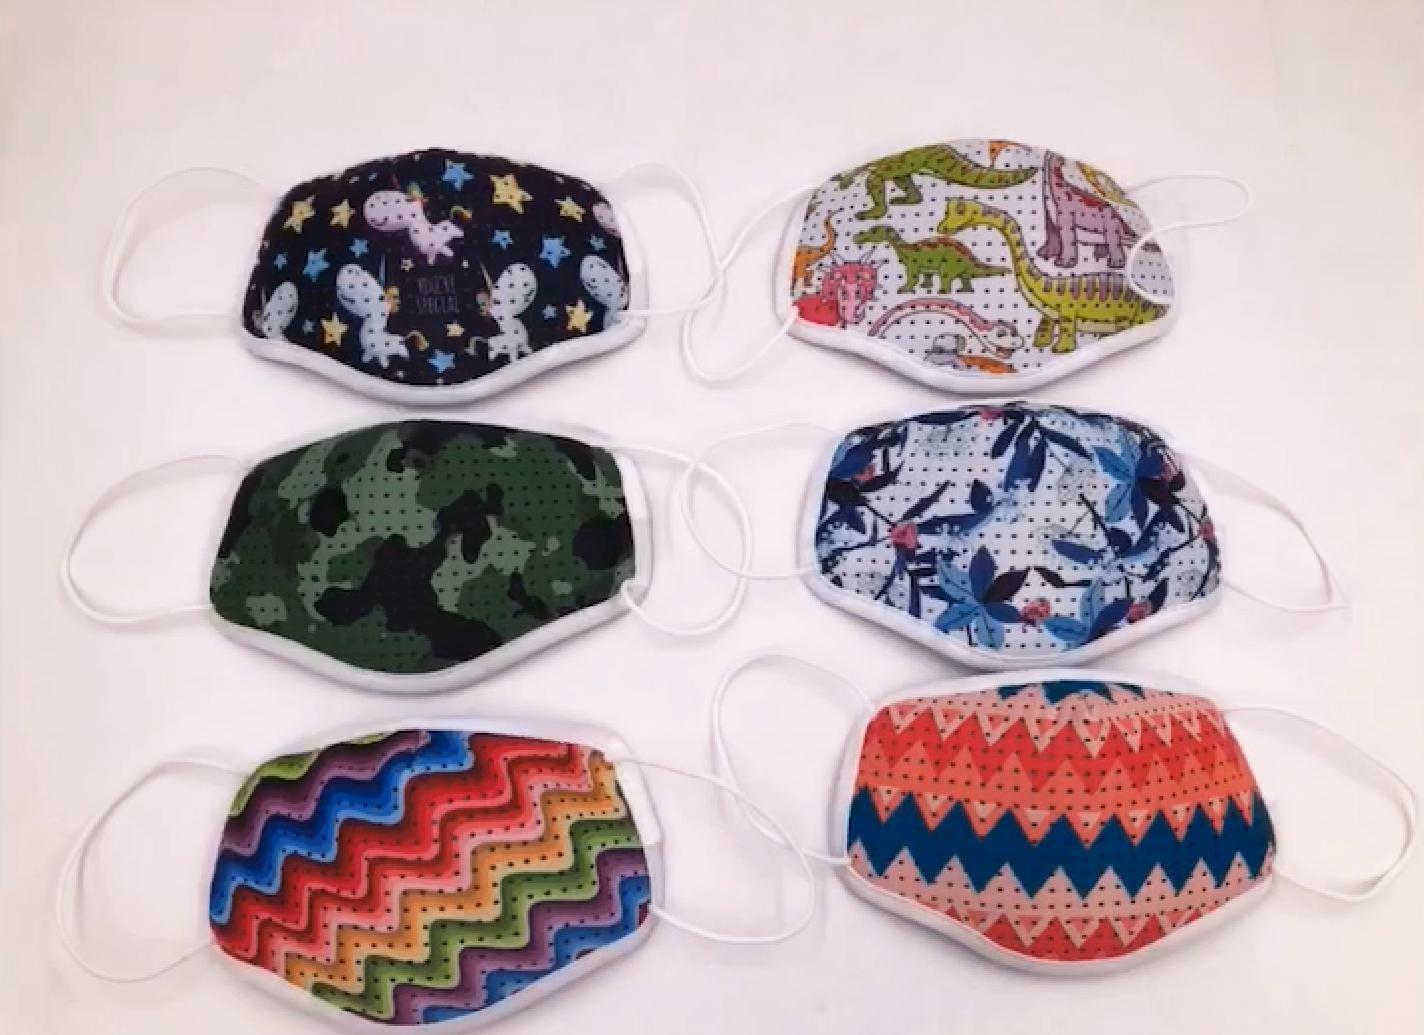 Fashion Protective washable anti odor fabric Isolation face mask 9